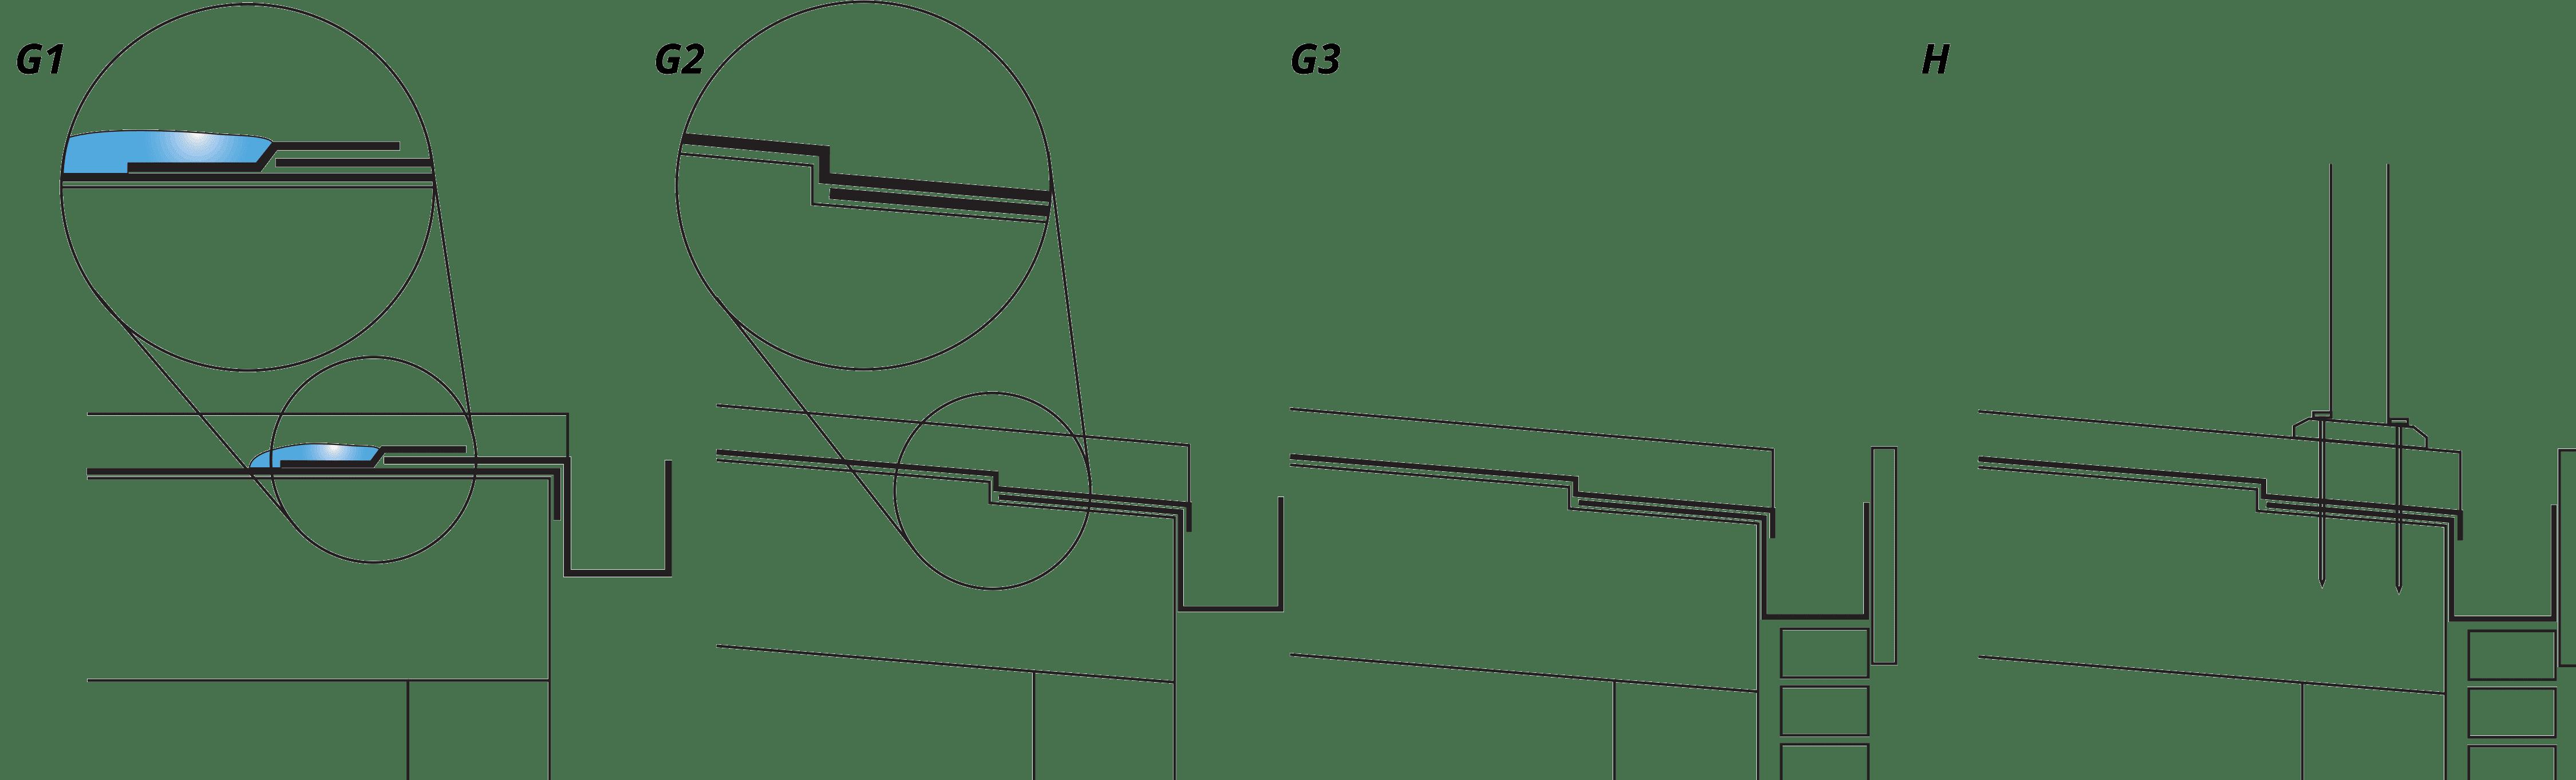 Drawings G1, G2, G3 H